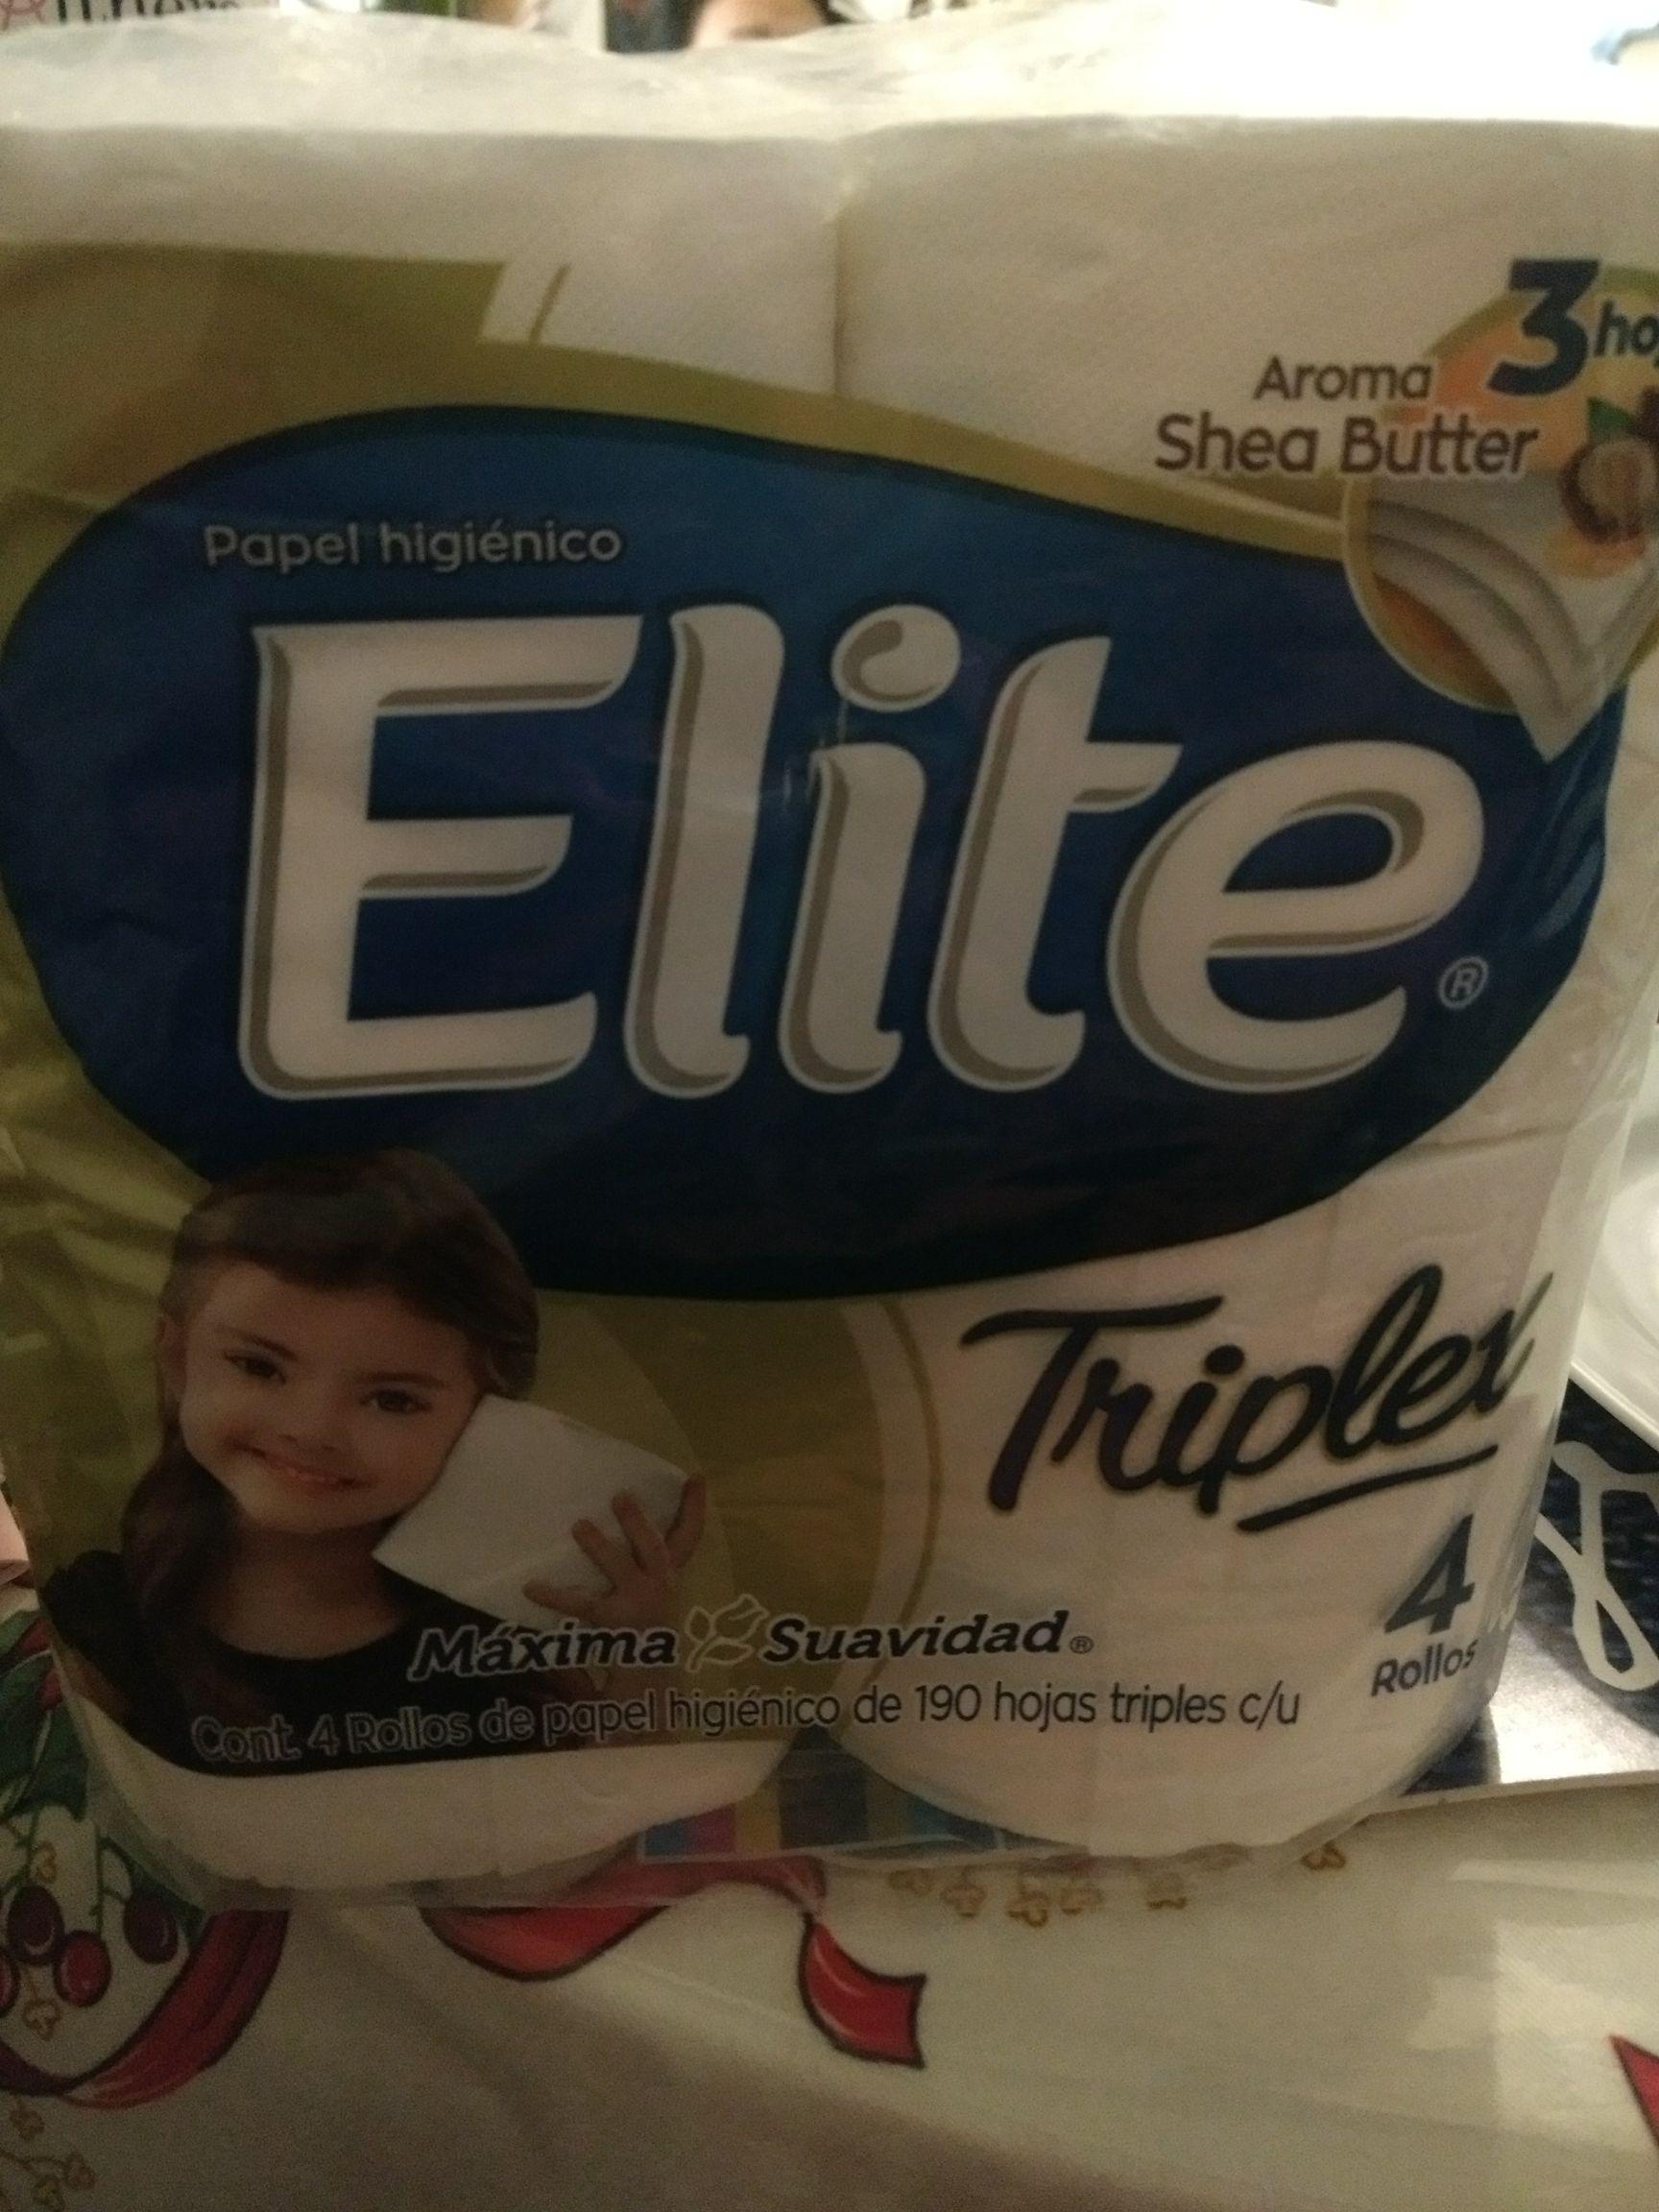 La comer: papel higiénico elite triplex paquete 4 rollos